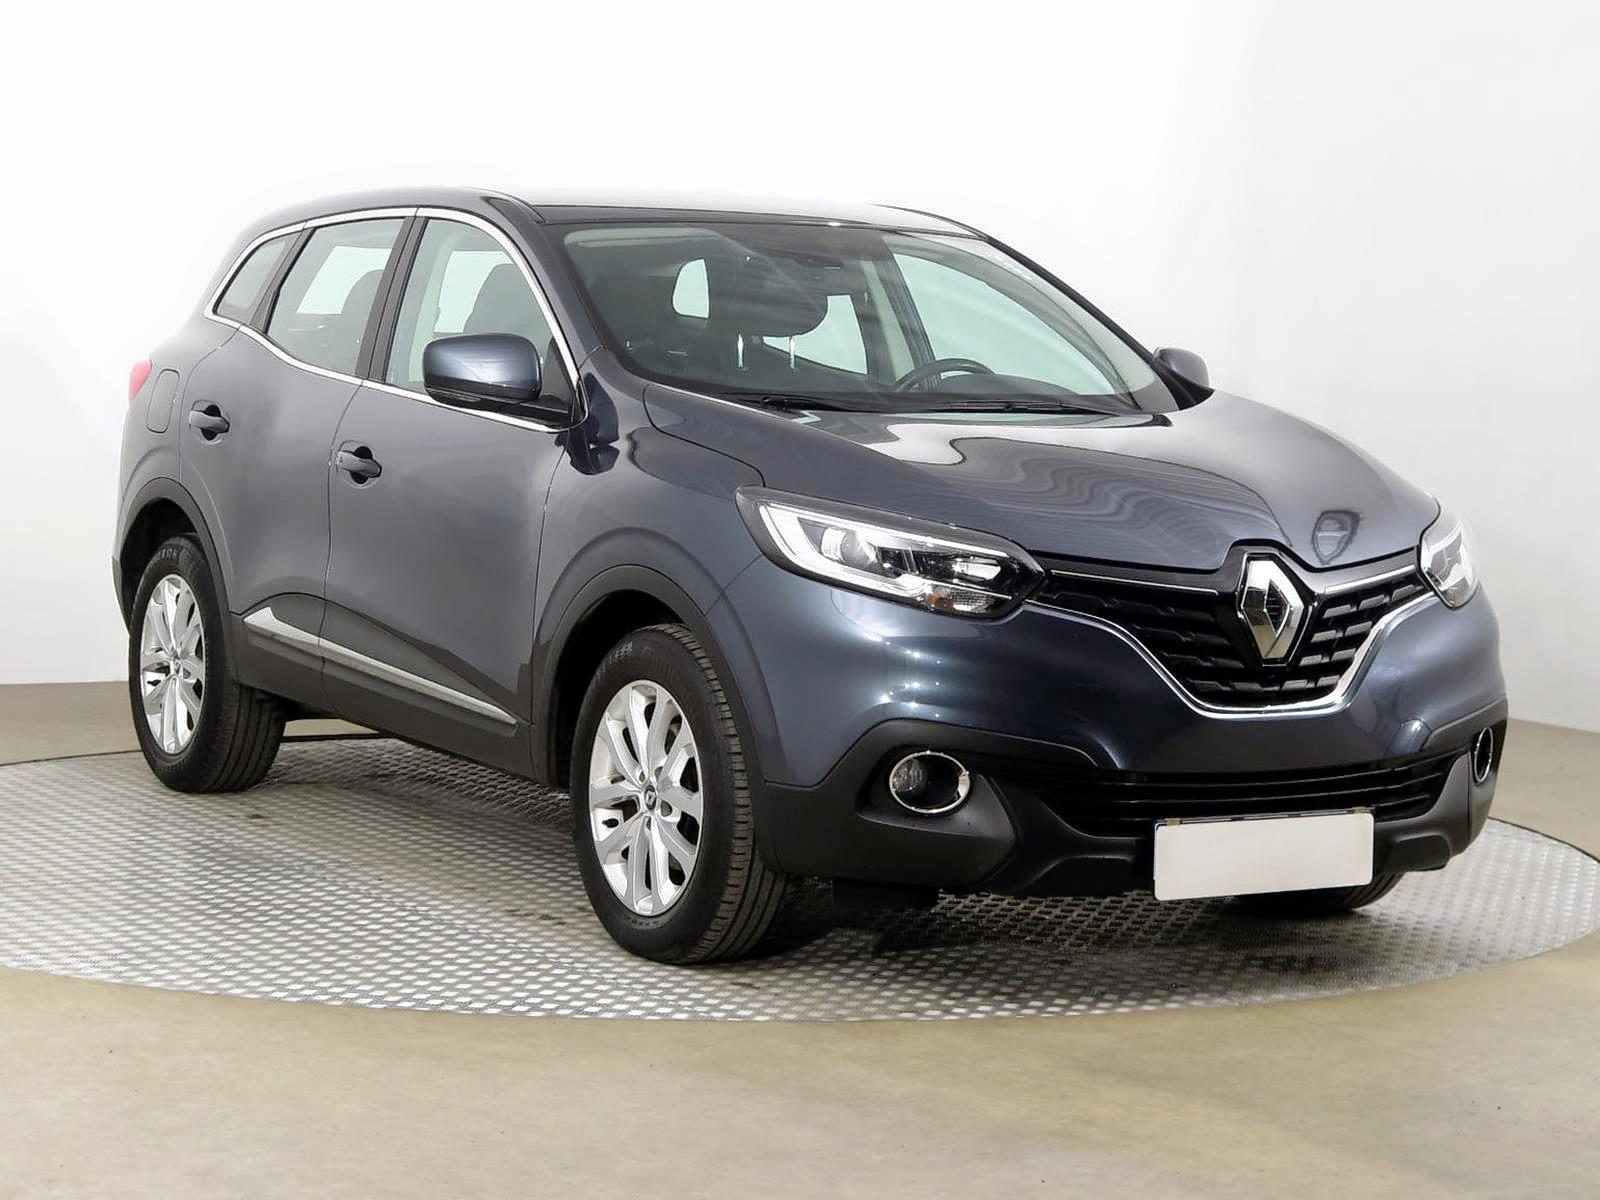 Renault Kadjar 1.6 dCi 96kW SUV nafta